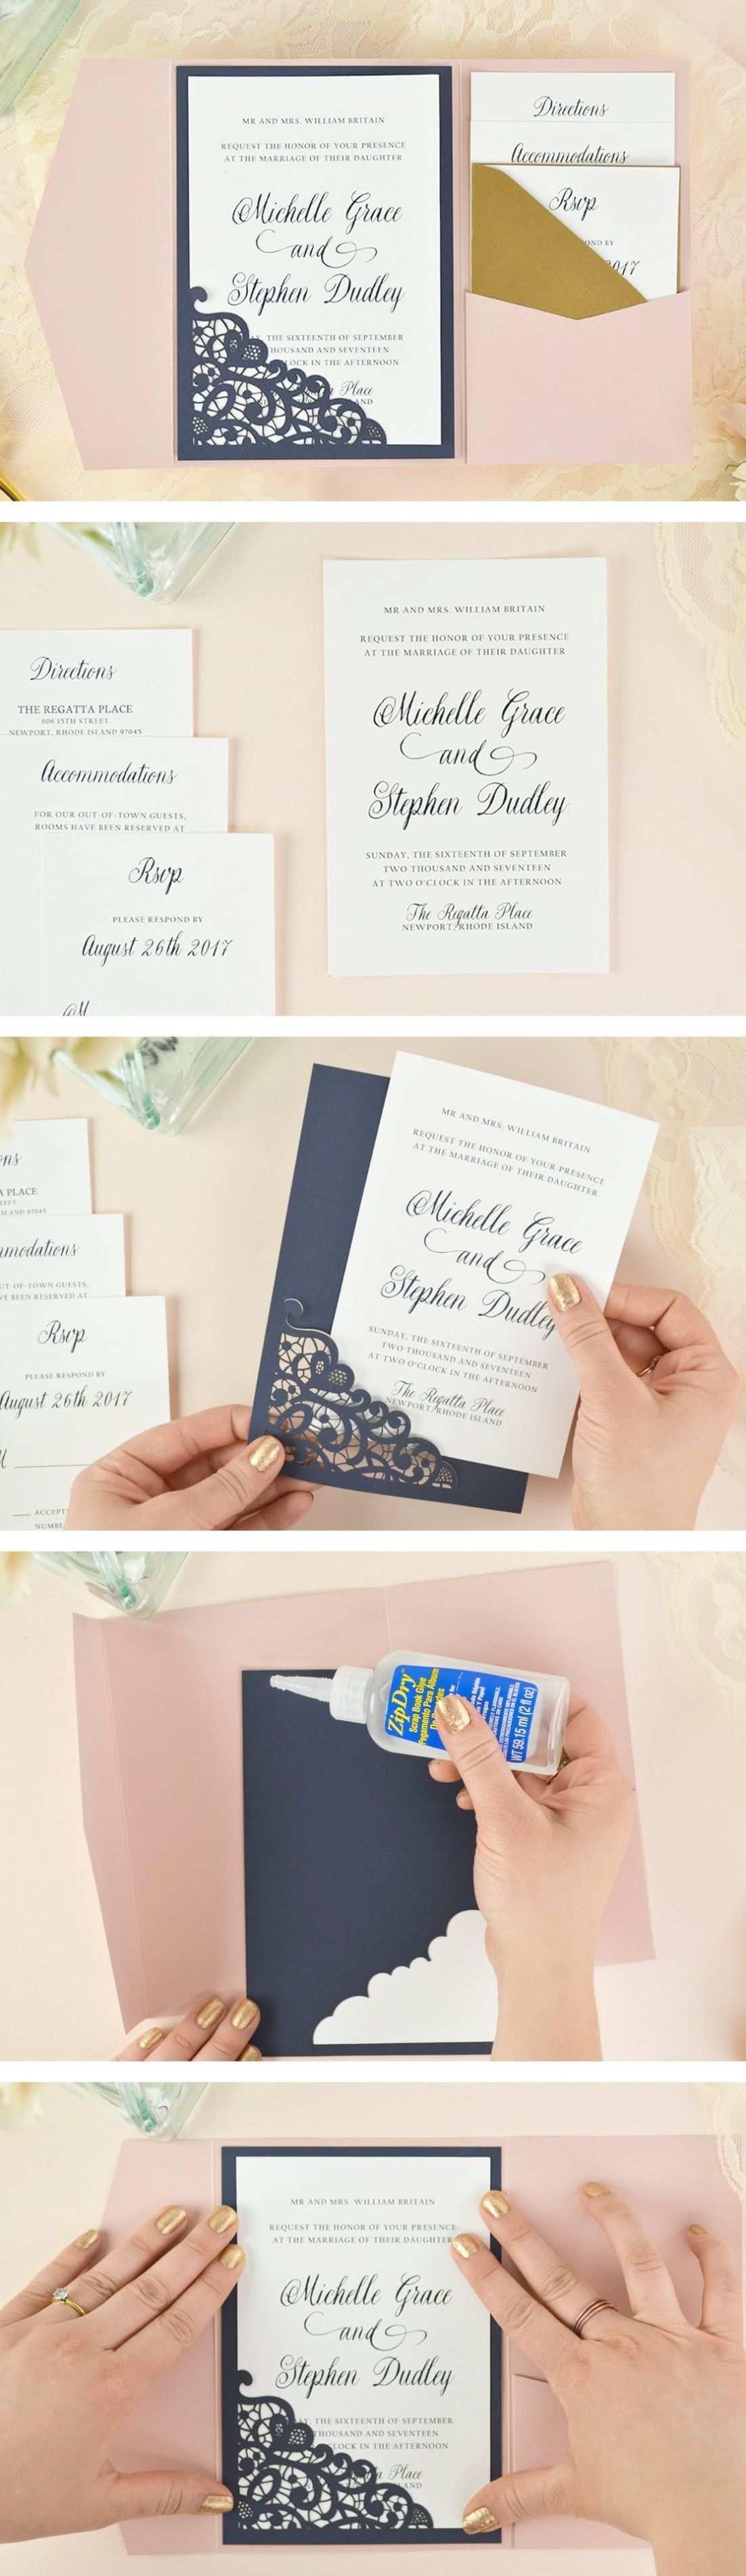 3 Adding Wedding Invitation Template Reddit Now by Wedding